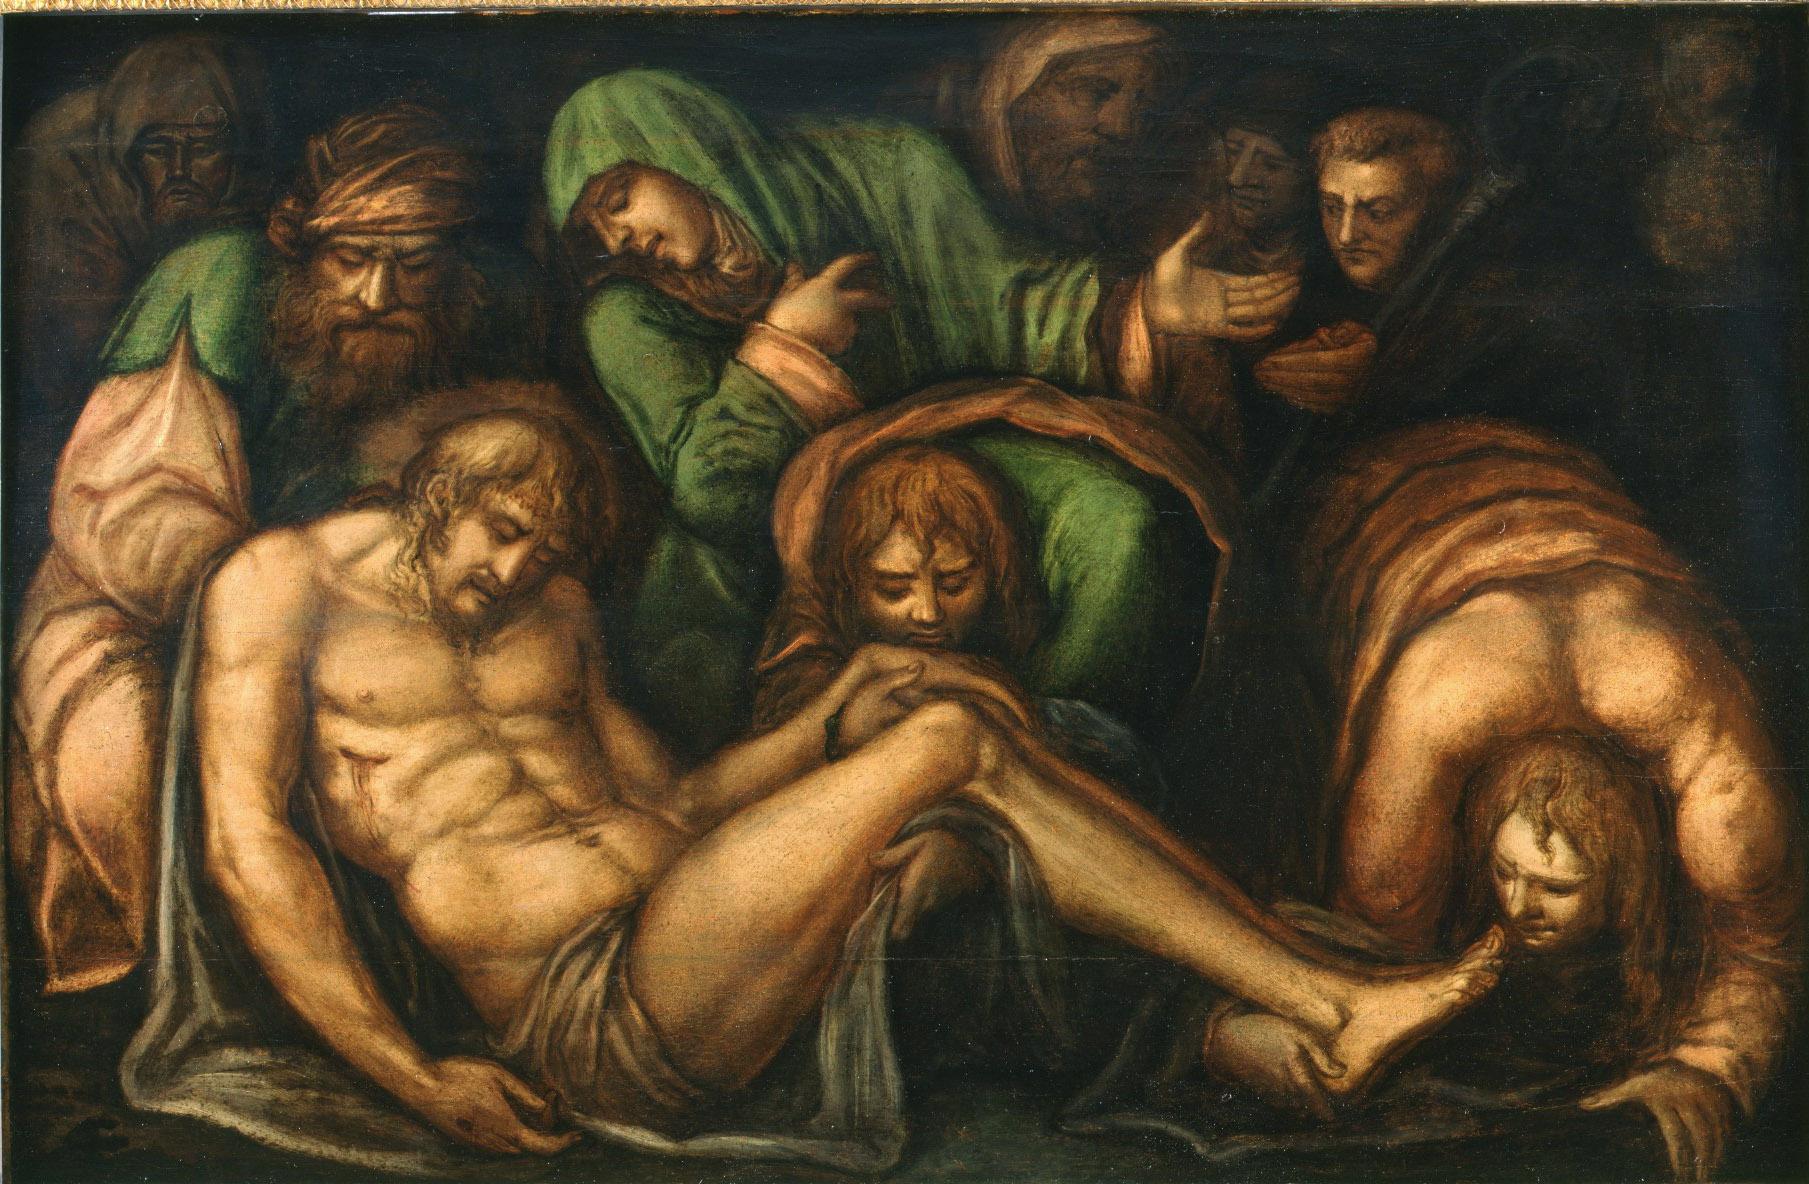 The 'La Lignamine' Crucifixion